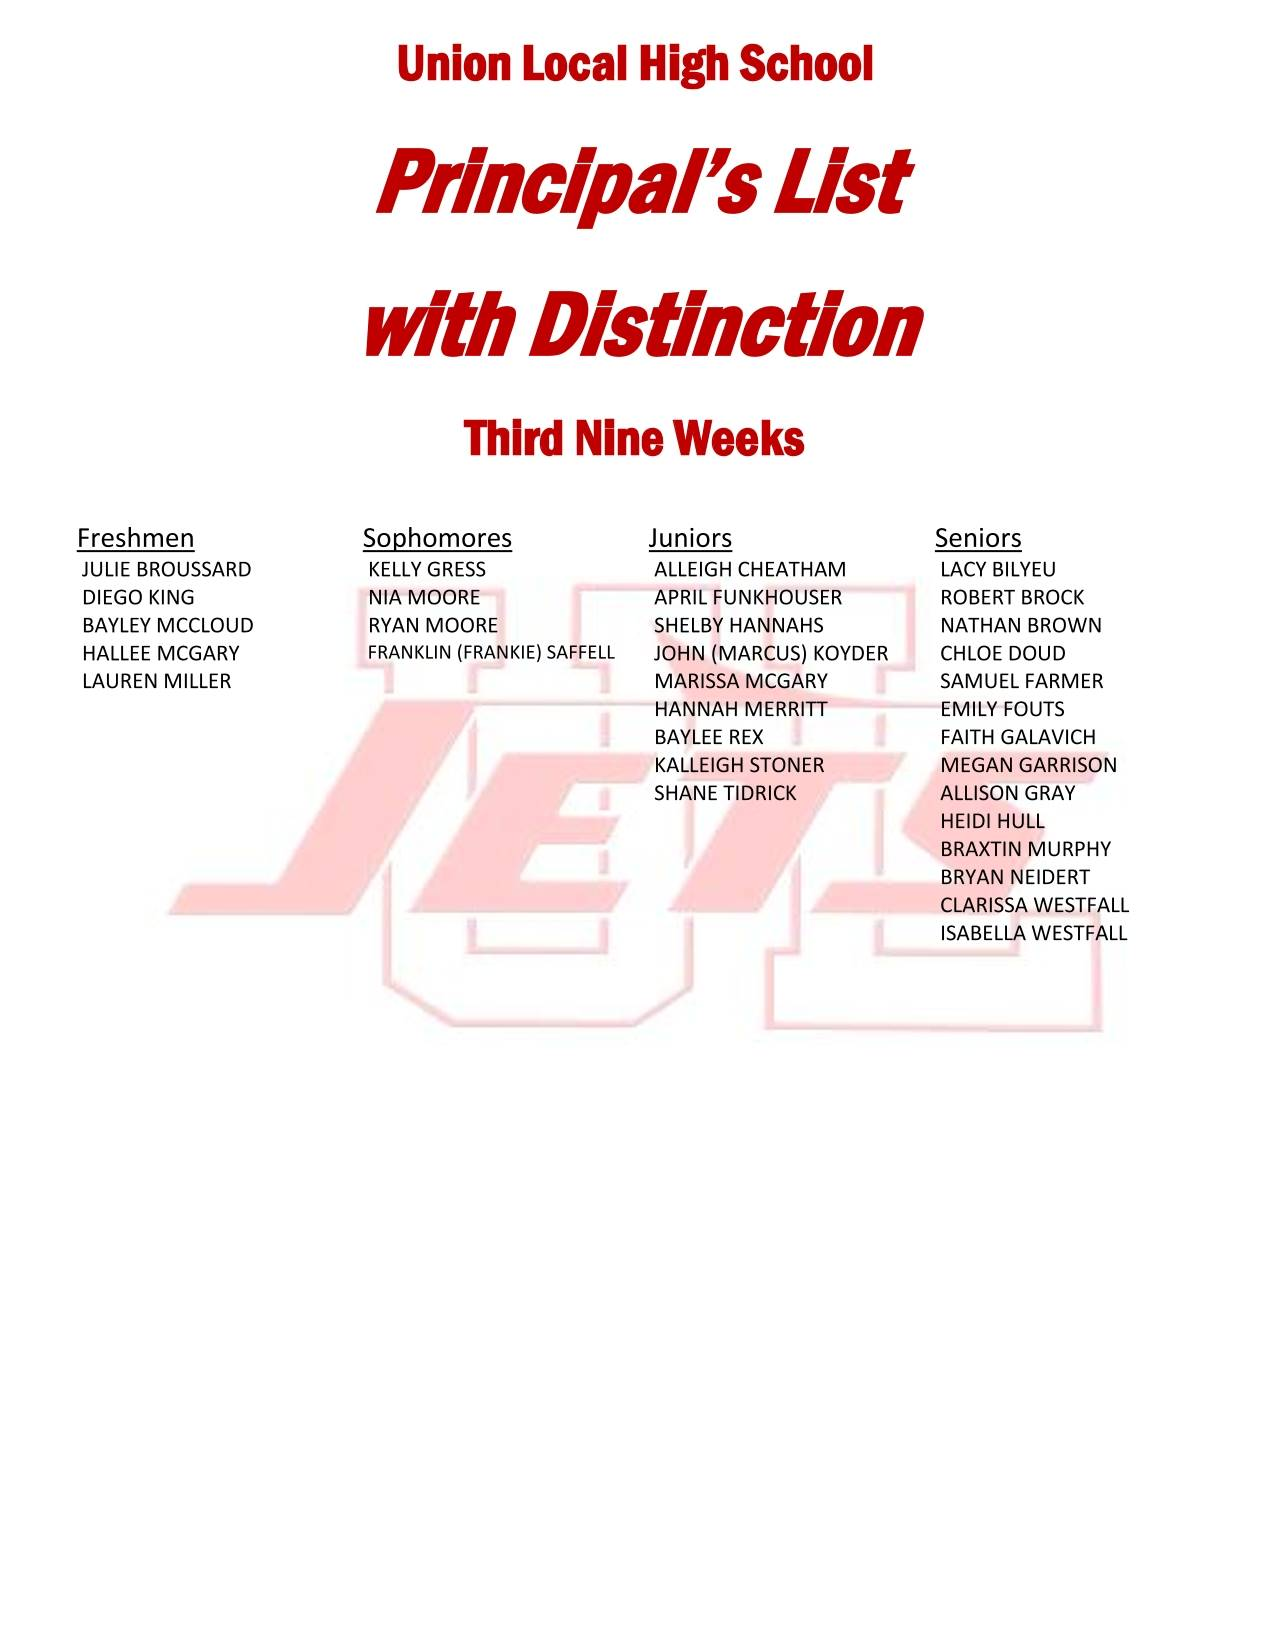 Principal's List with Distinction Third Nine Weeks